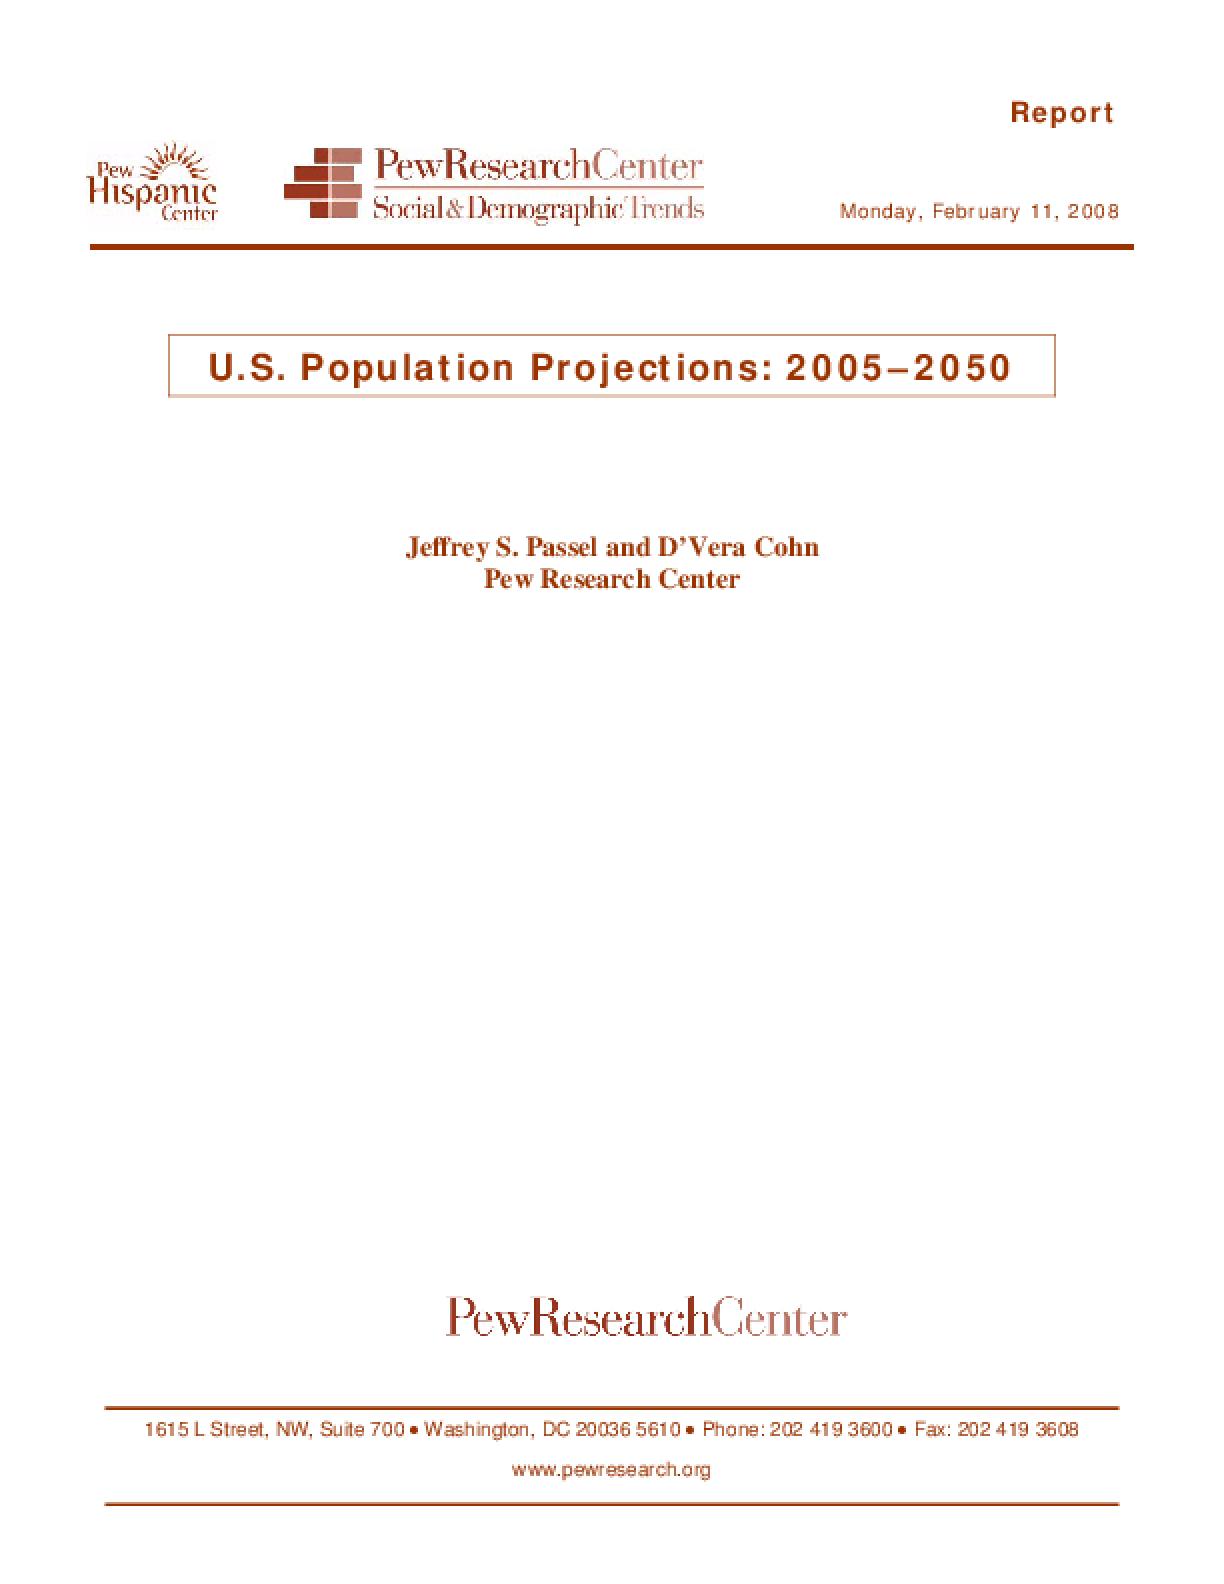 U.S. Population Projections: 2005-2050